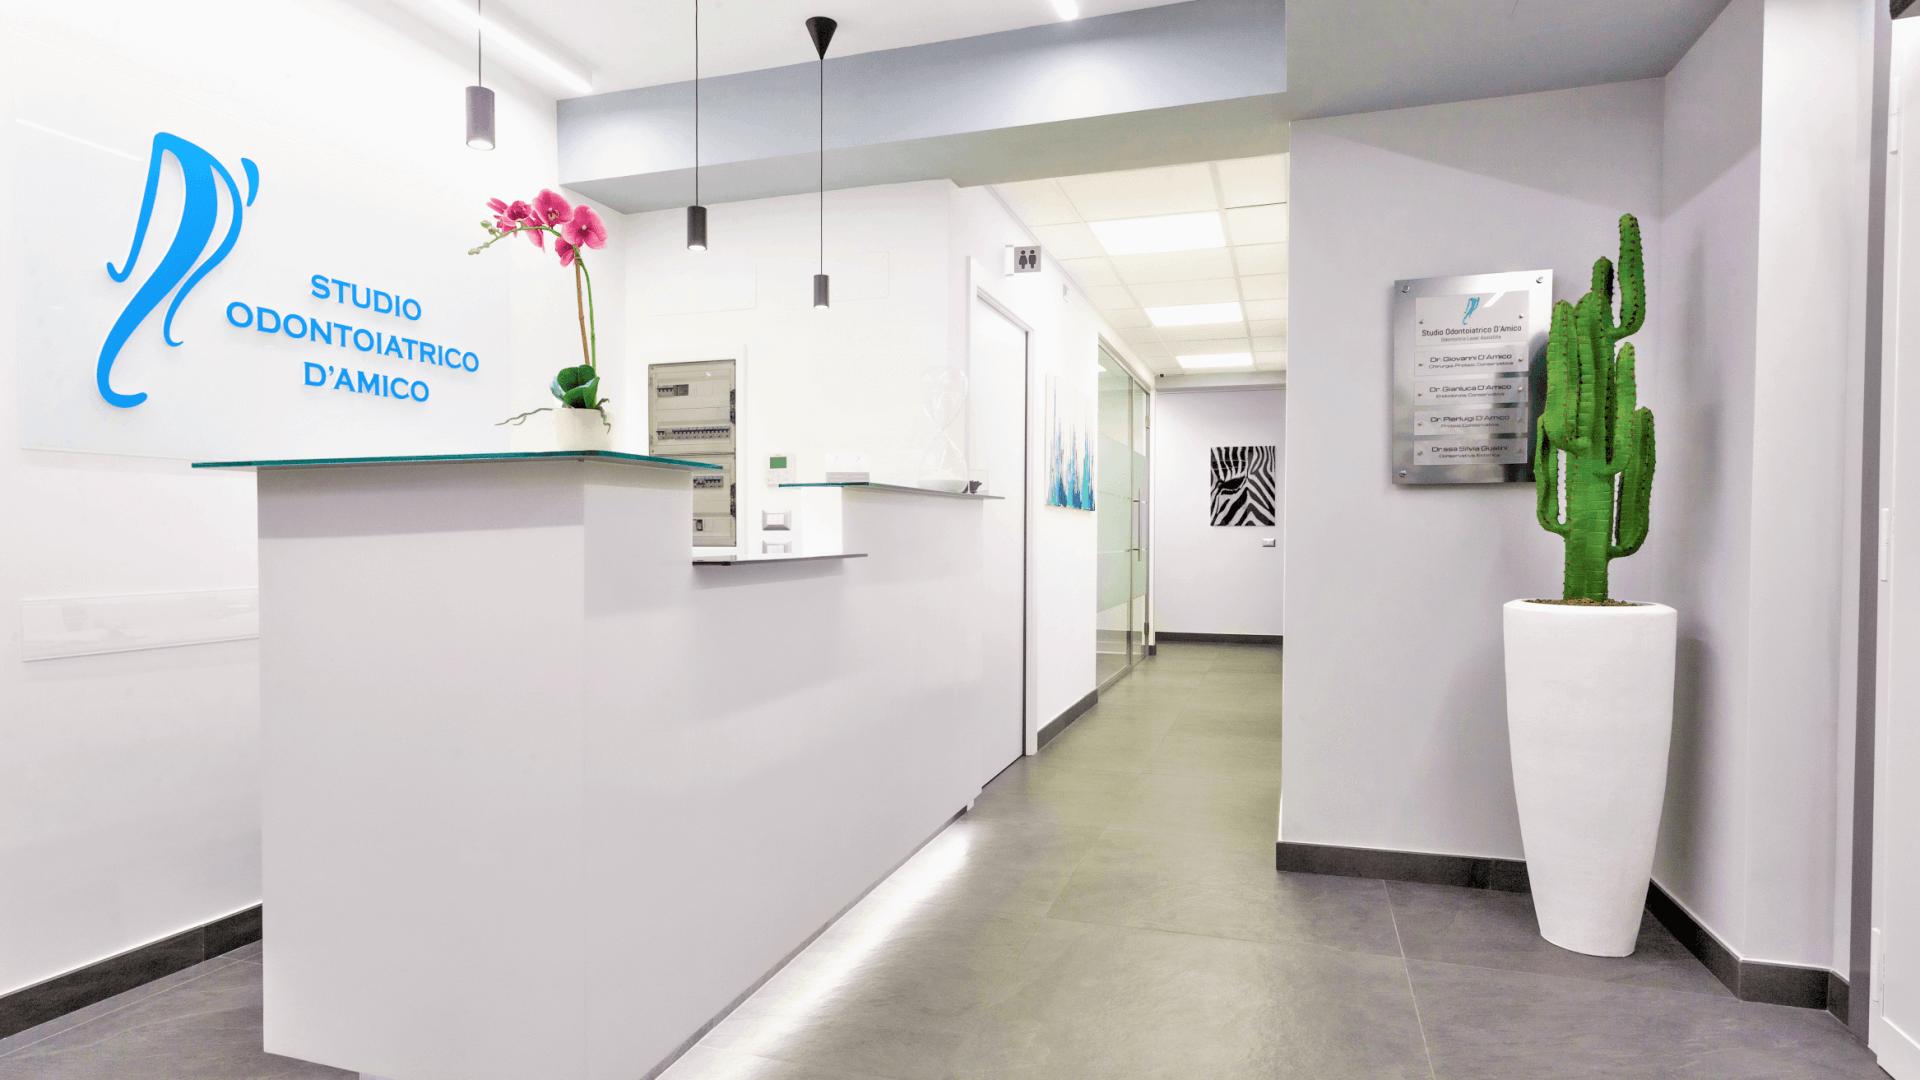 Studio Odontoiatrico D'Amico